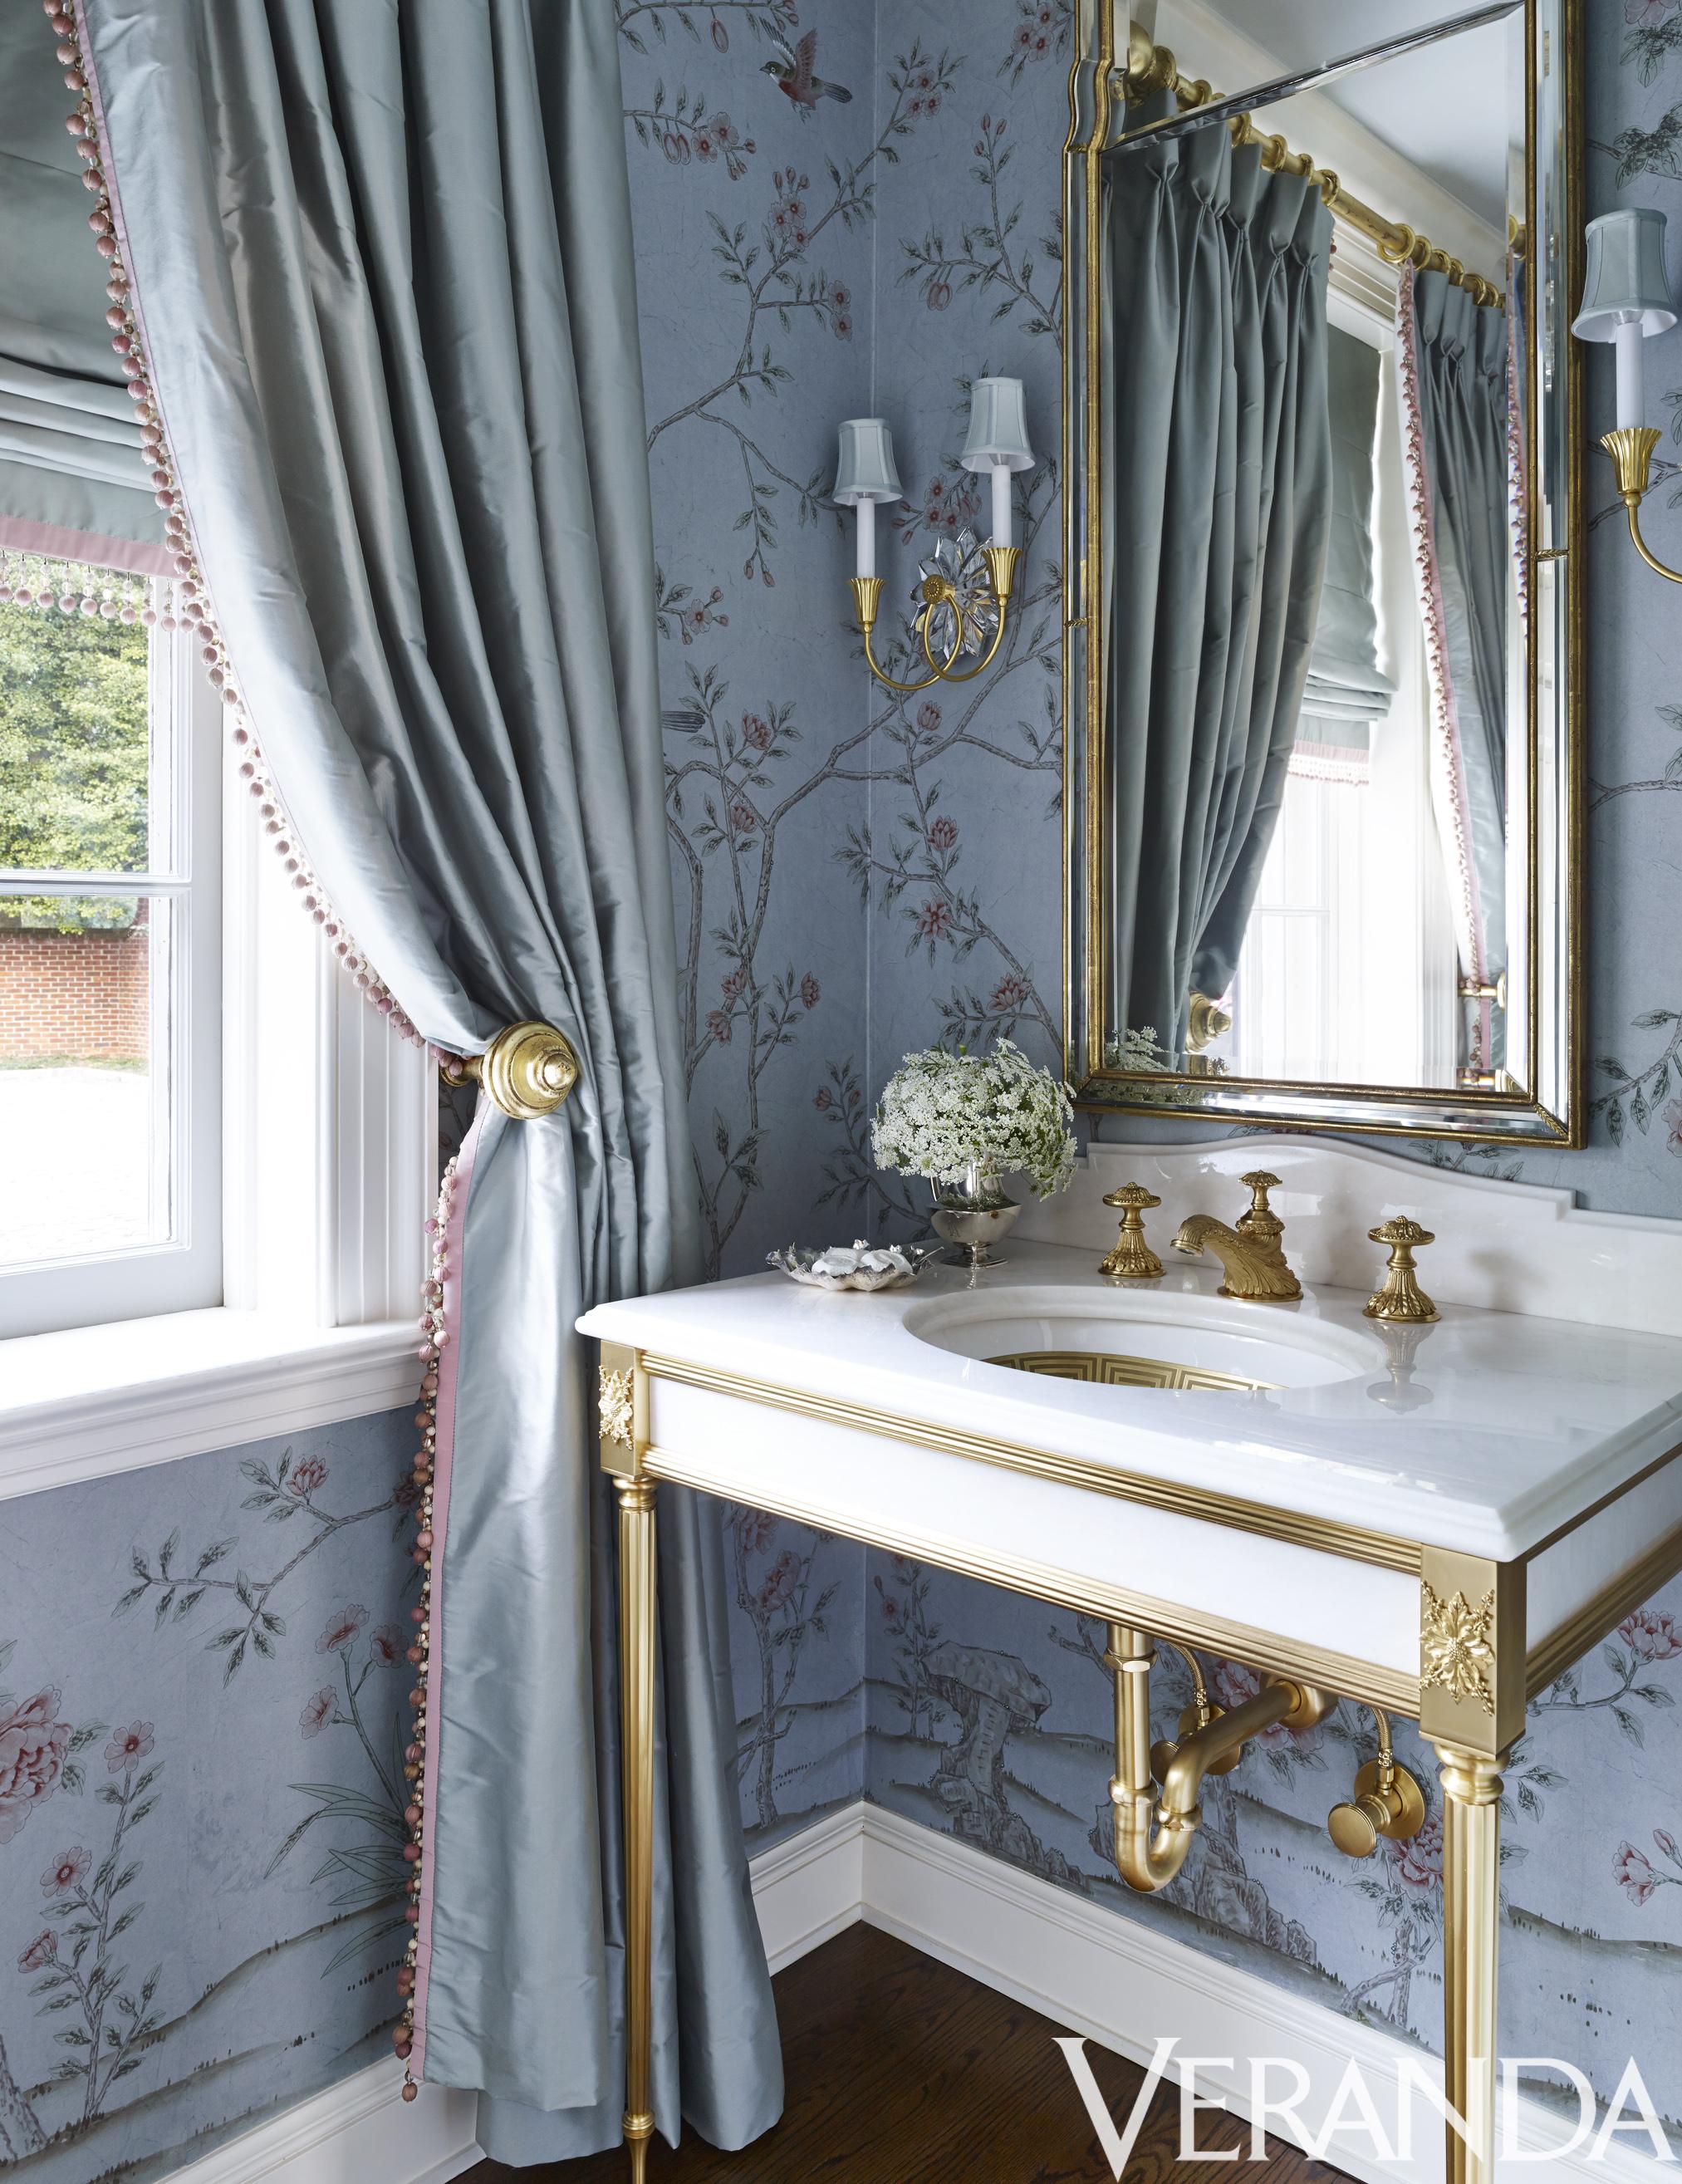 15 Best Small Bathroom Ideas - Bathroom Designs on Small Space Small Bathroom Ideas With Bath And Shower id=46084